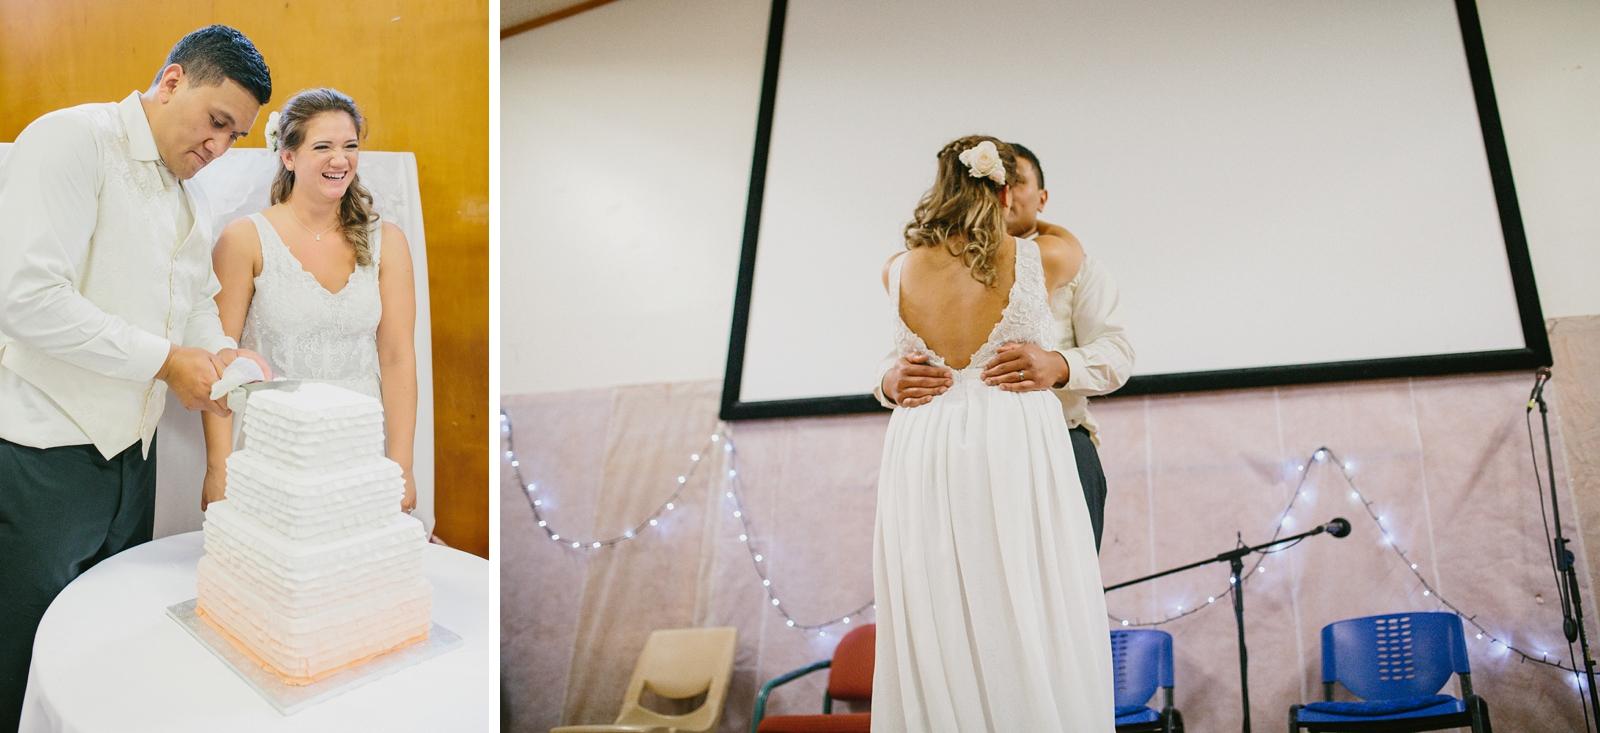 GabbyFiti_Auckland Wedding Photographer_Patty Lagera_0100.jpg